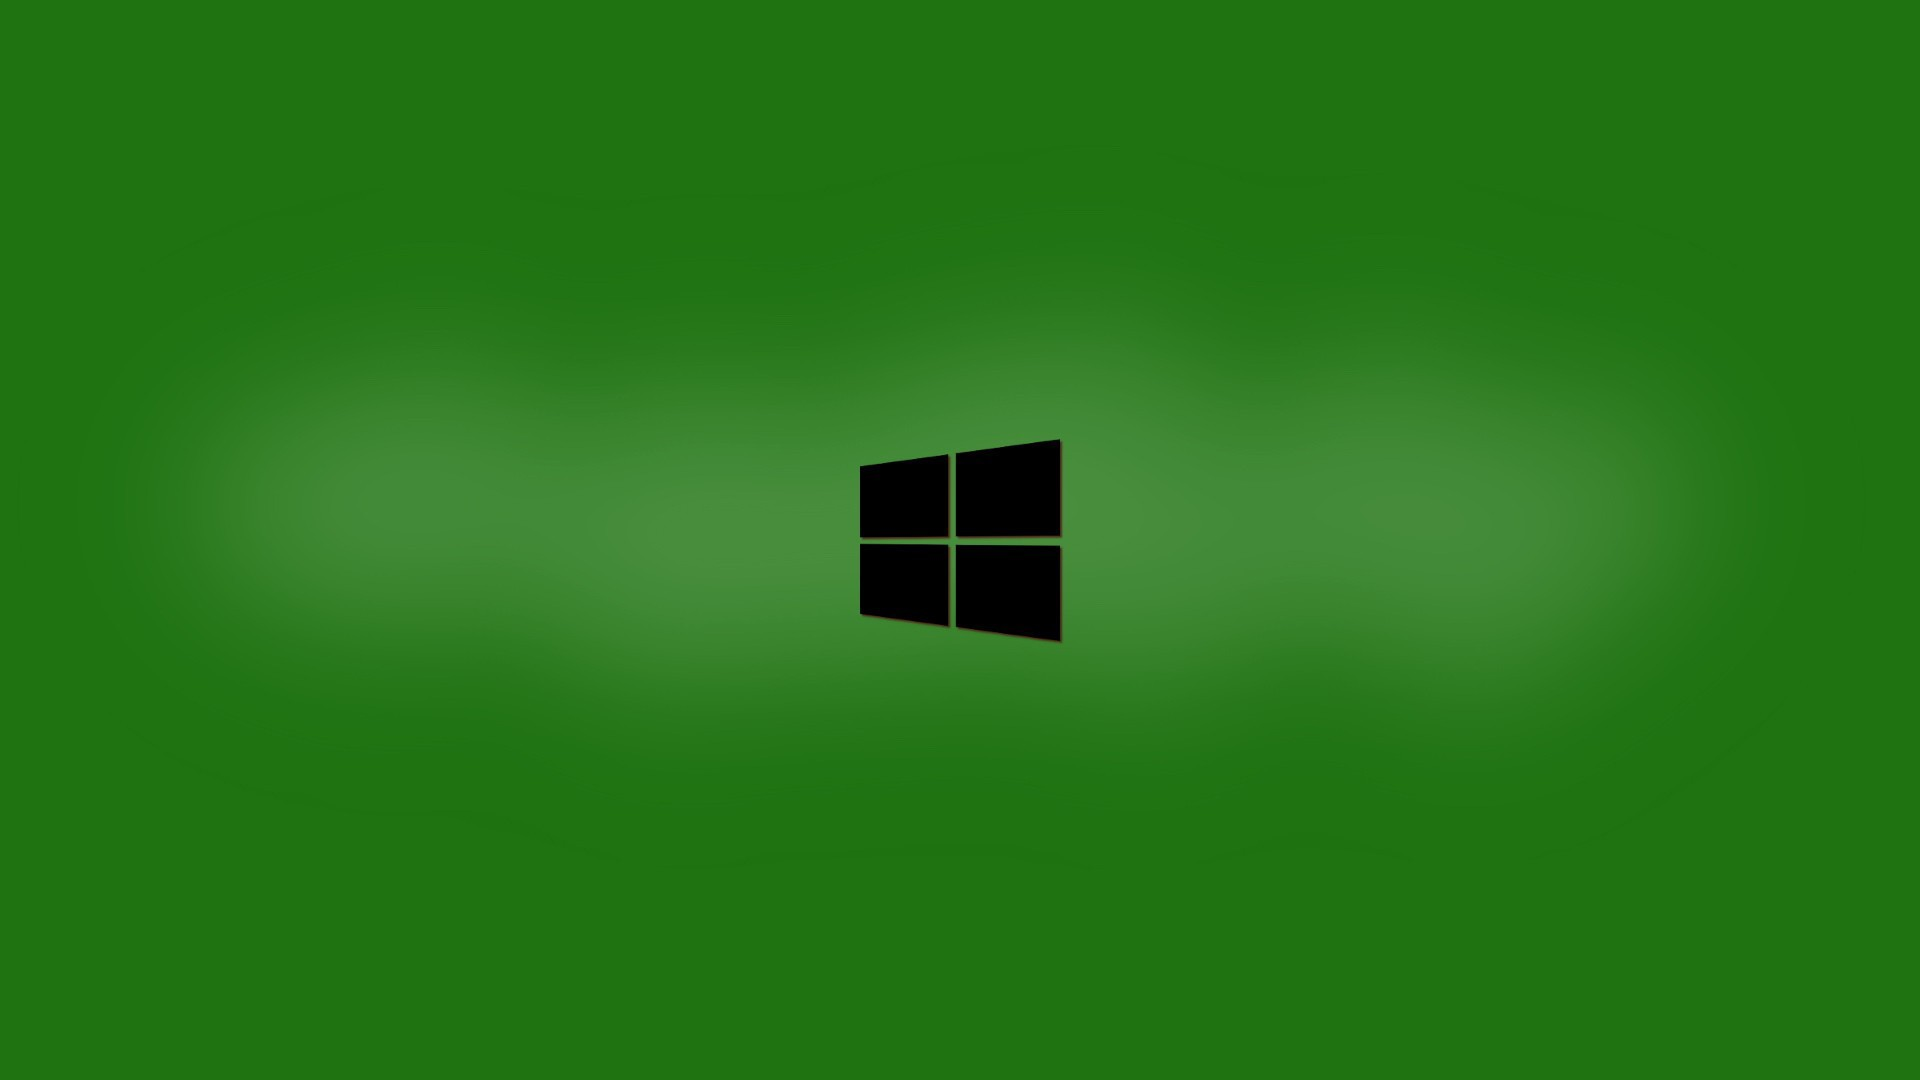 Download Windows 8 Wallpaper Hd 1080p Free Wallpaper - Full Hd Wallpaper Of Windows 10 - HD Wallpaper